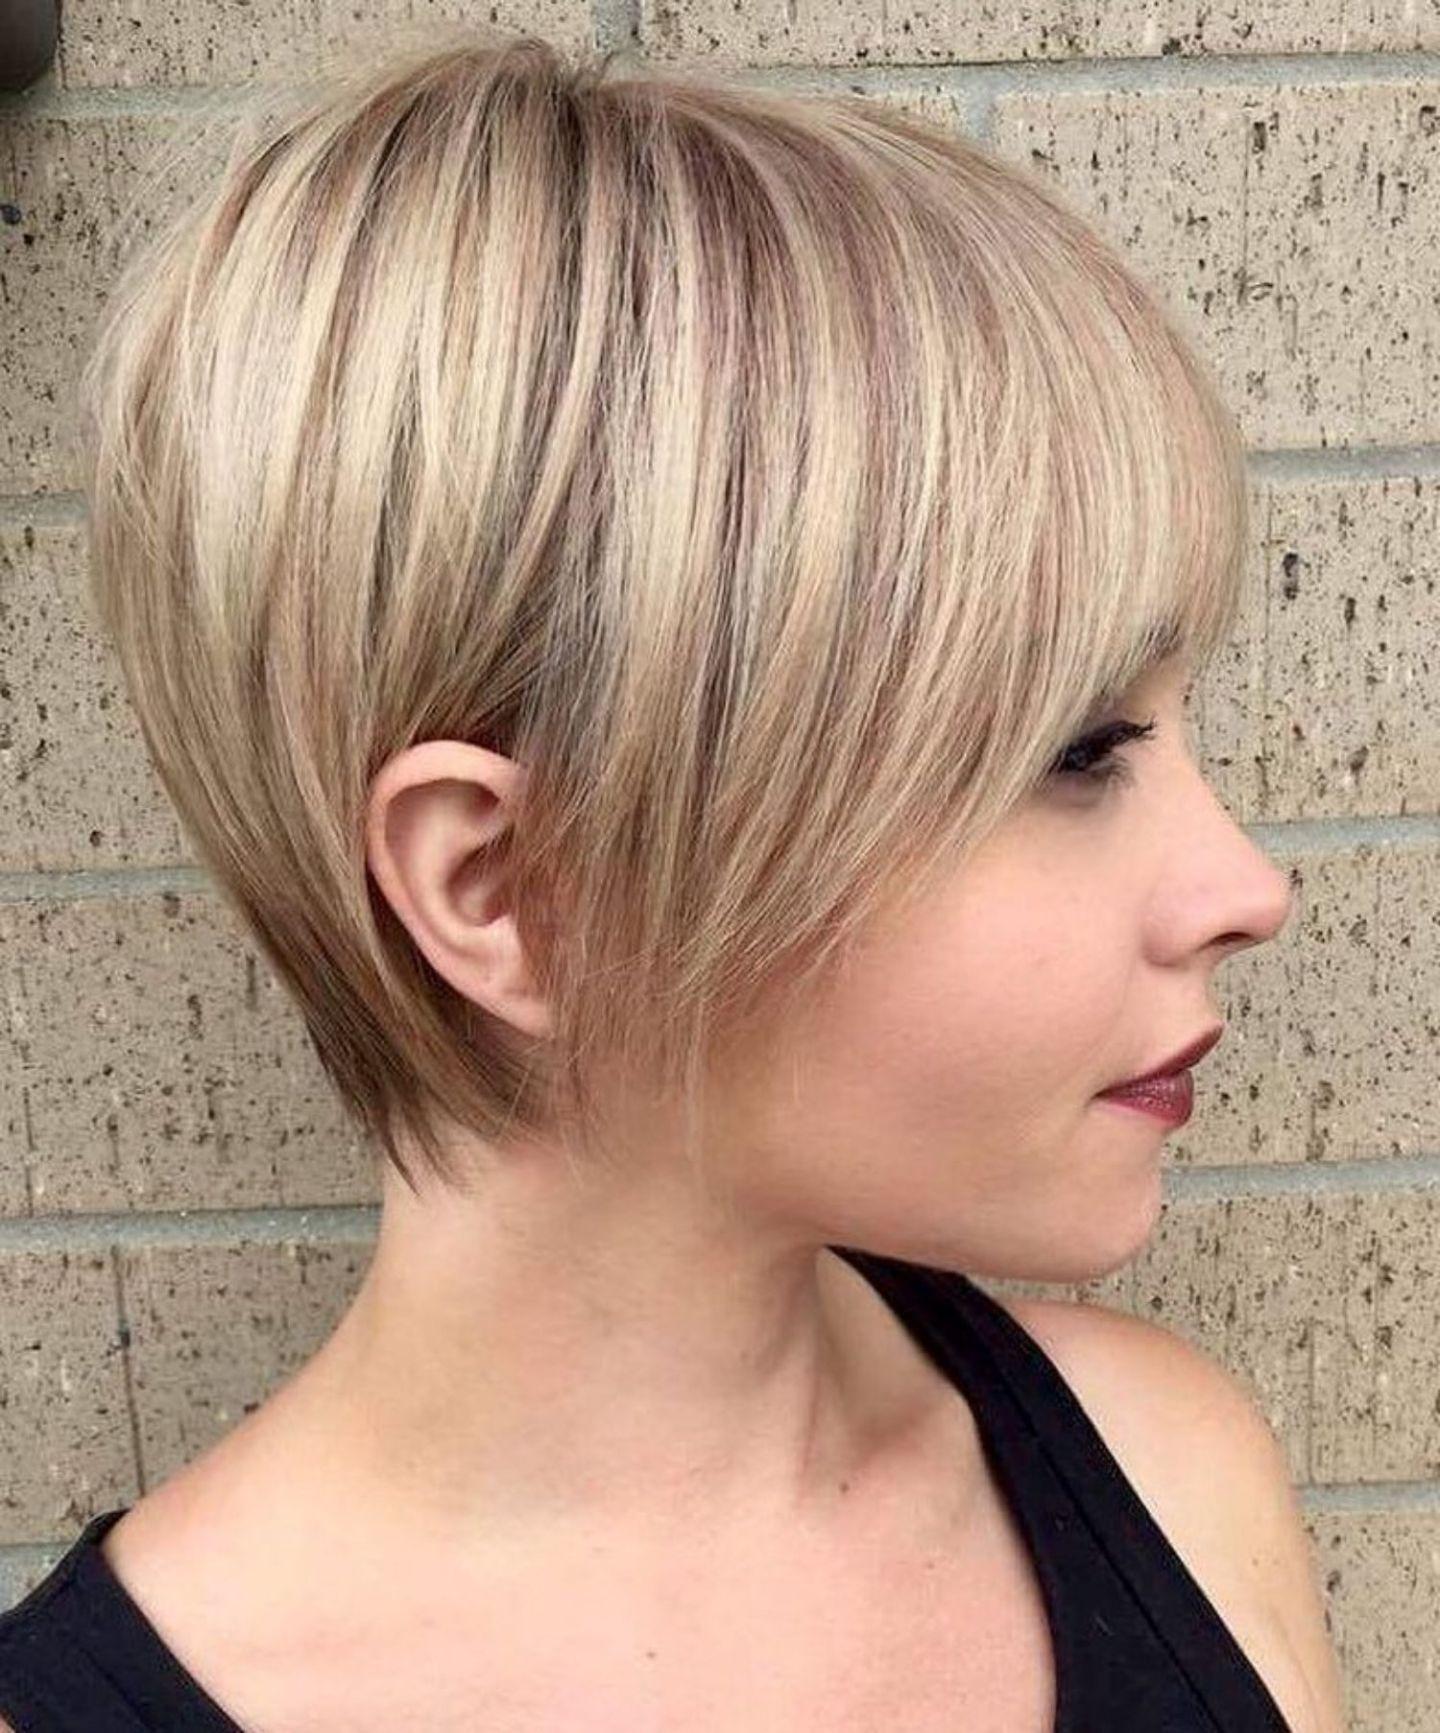 Long Feathered Blonde Pixie Longer Pixie Haircut Short Hair With Layers Short Choppy Hair